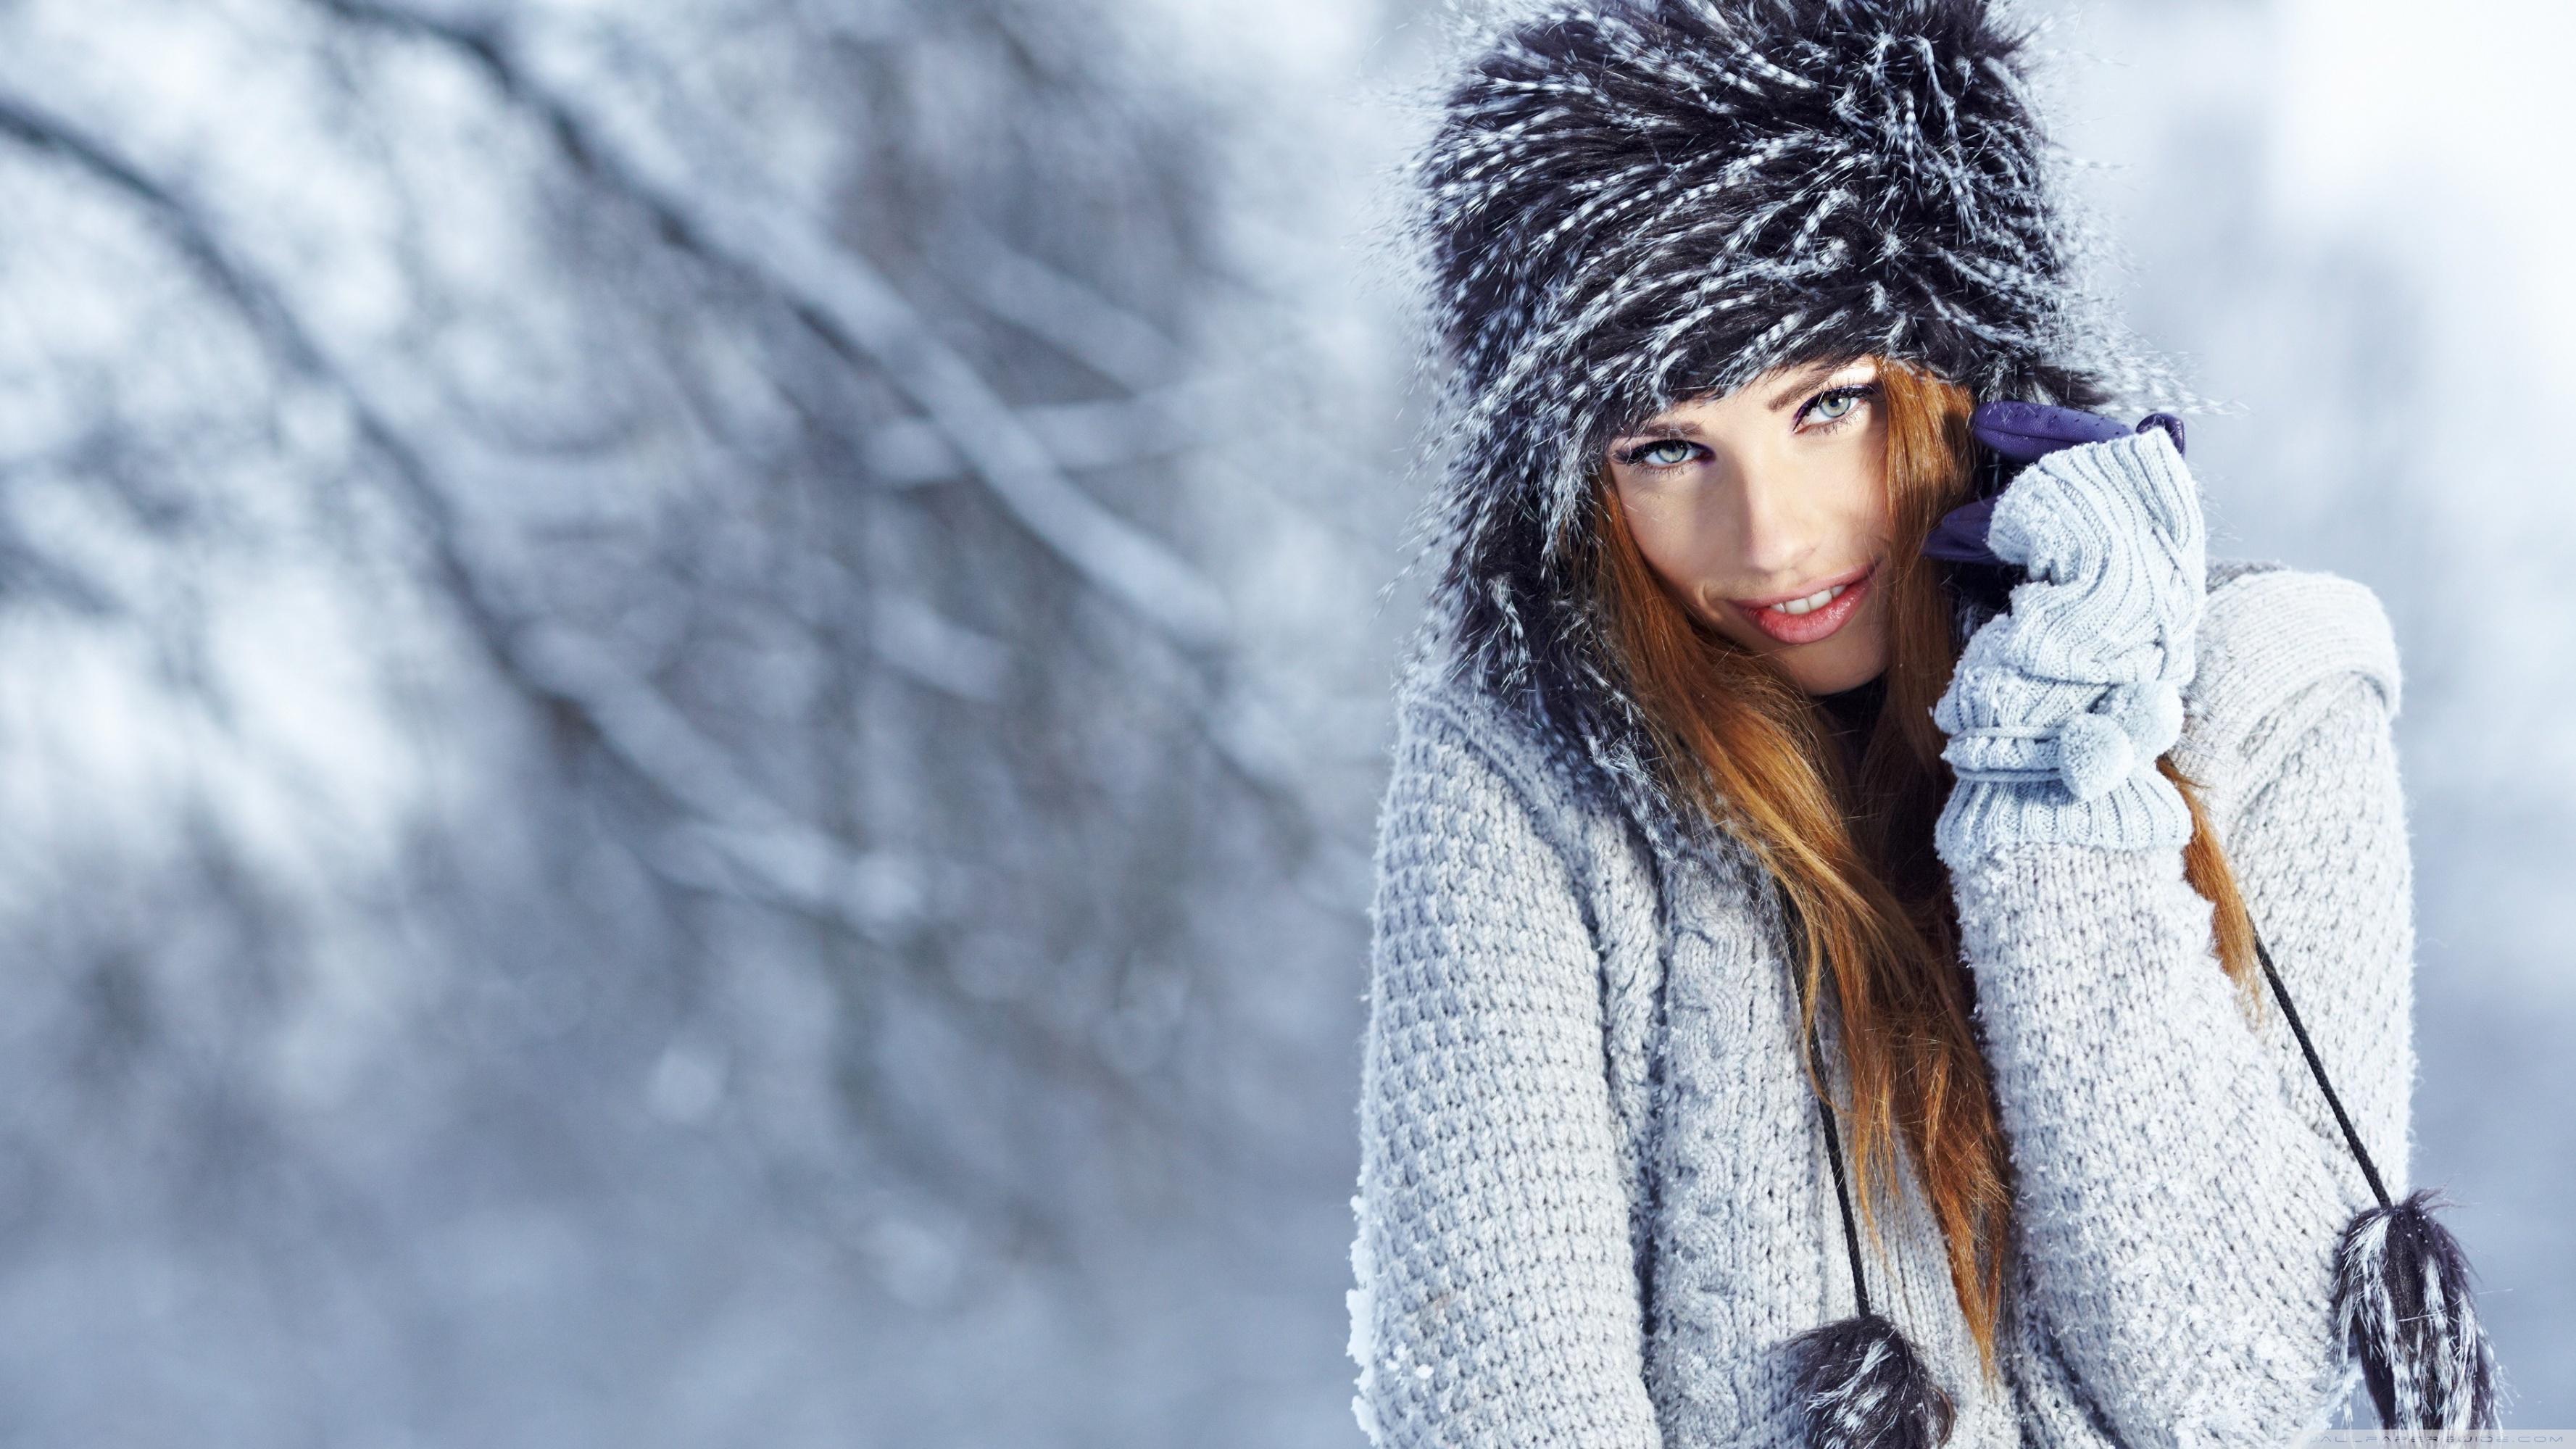 Girls Winter Pics Wallpapers Wallpaper Cave